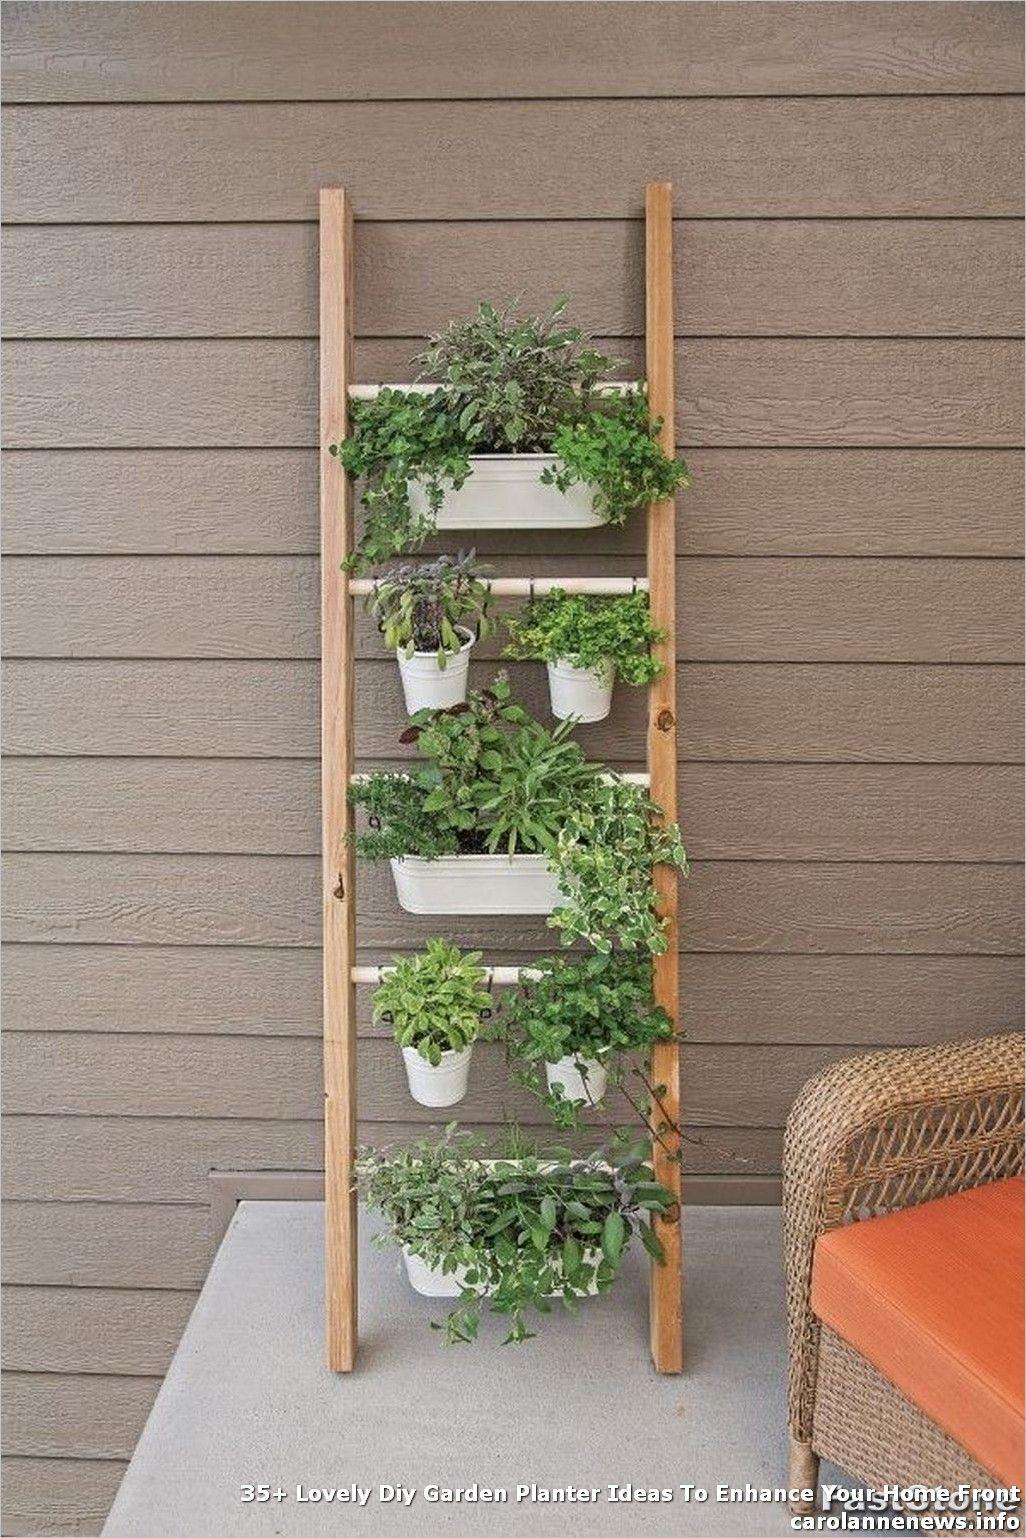 35+ #Lovely #Diy #Garden #Planter #Ideas #To #Enhance #Your #Home #Front